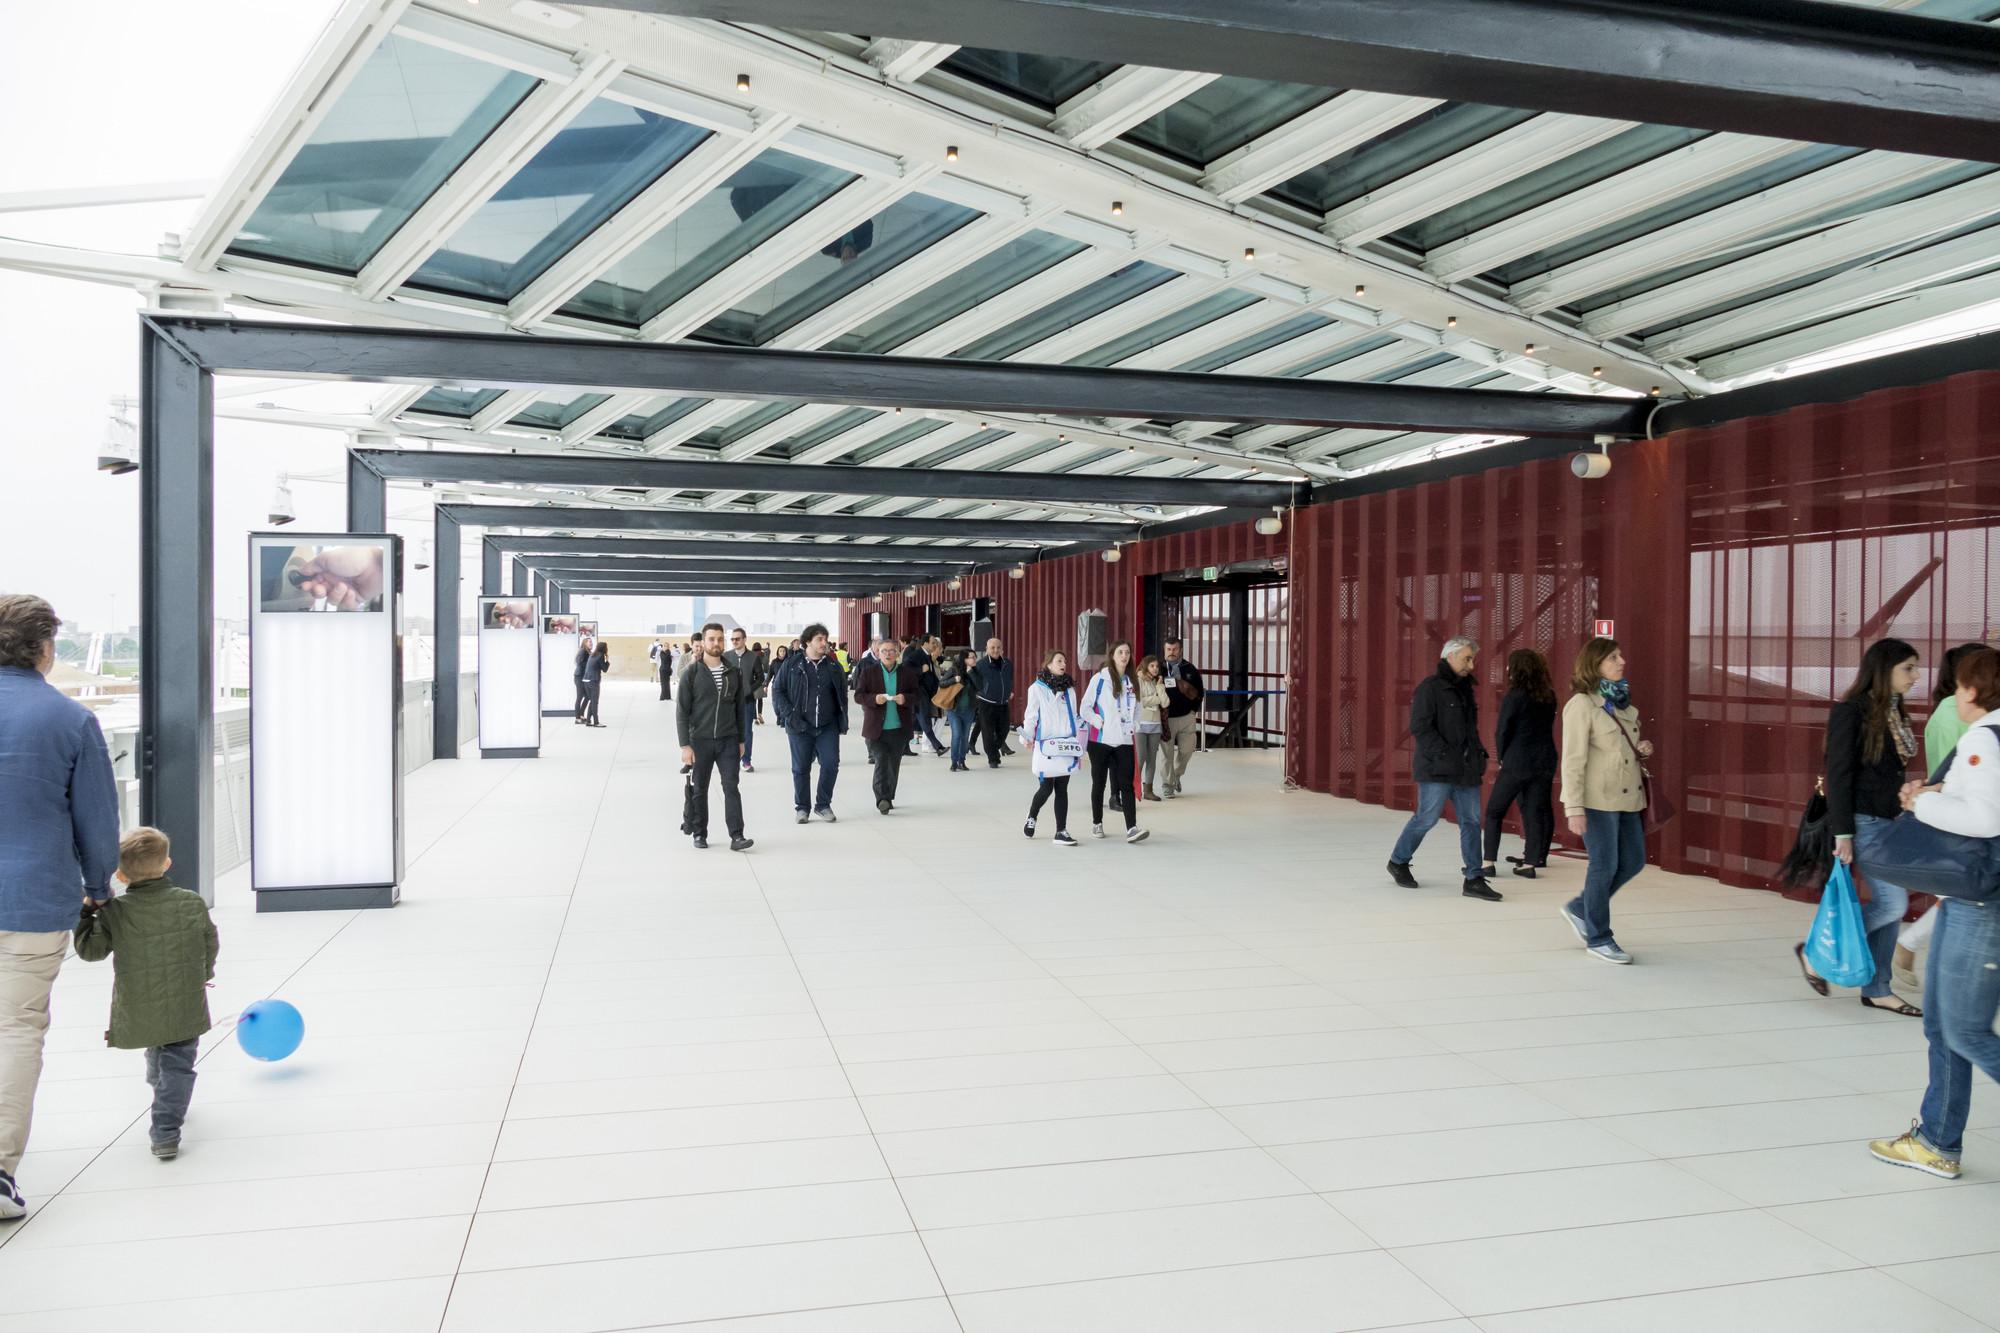 Pavilion United States Milan Expo 2015